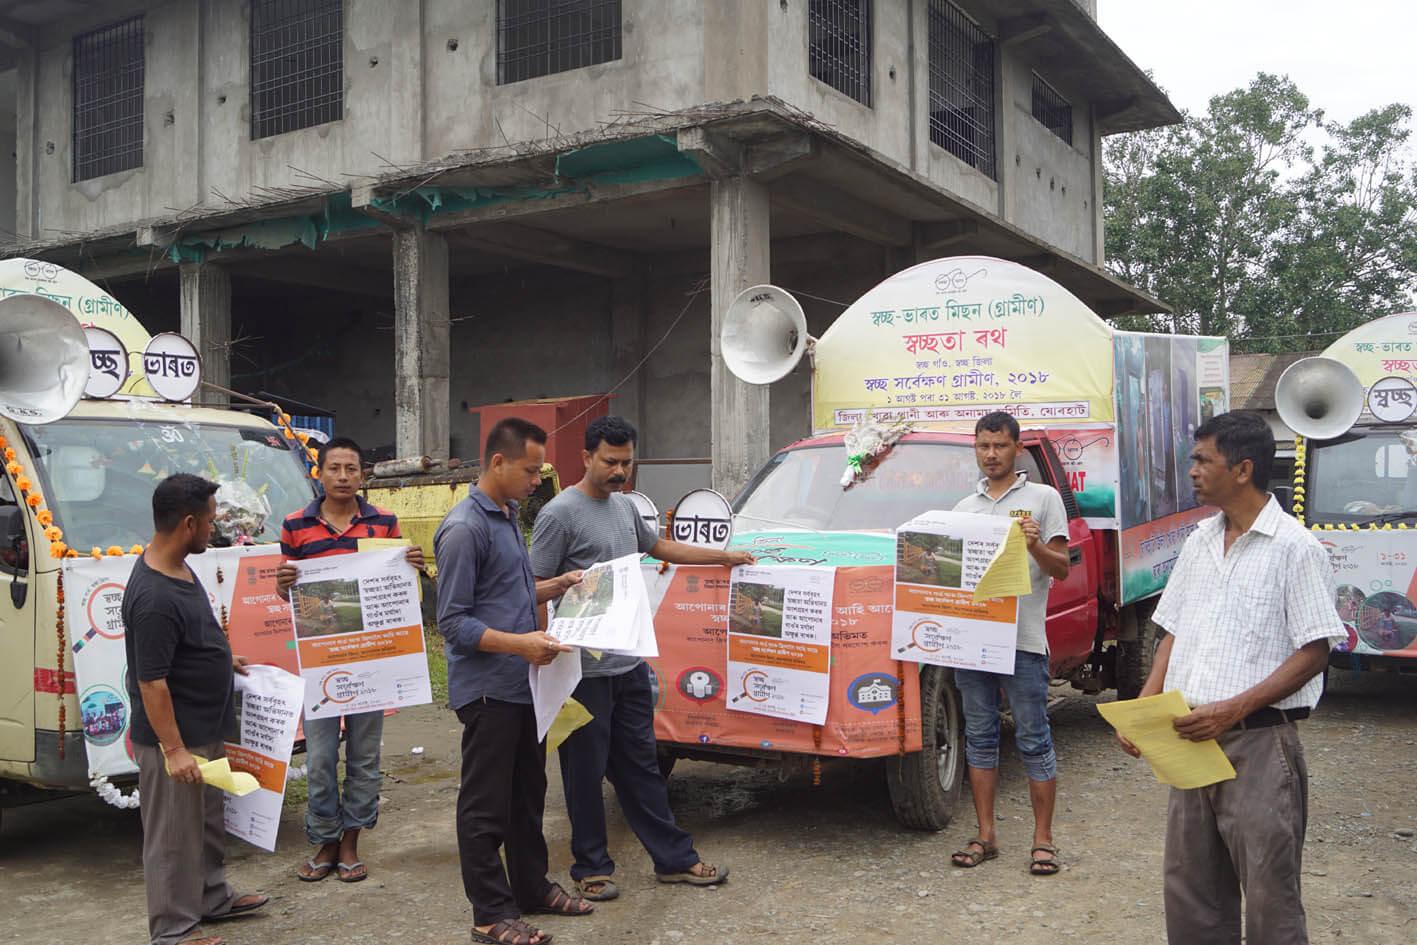 Public Health Engineering Department (PHE), Jorhat flags off Swachhta Rath